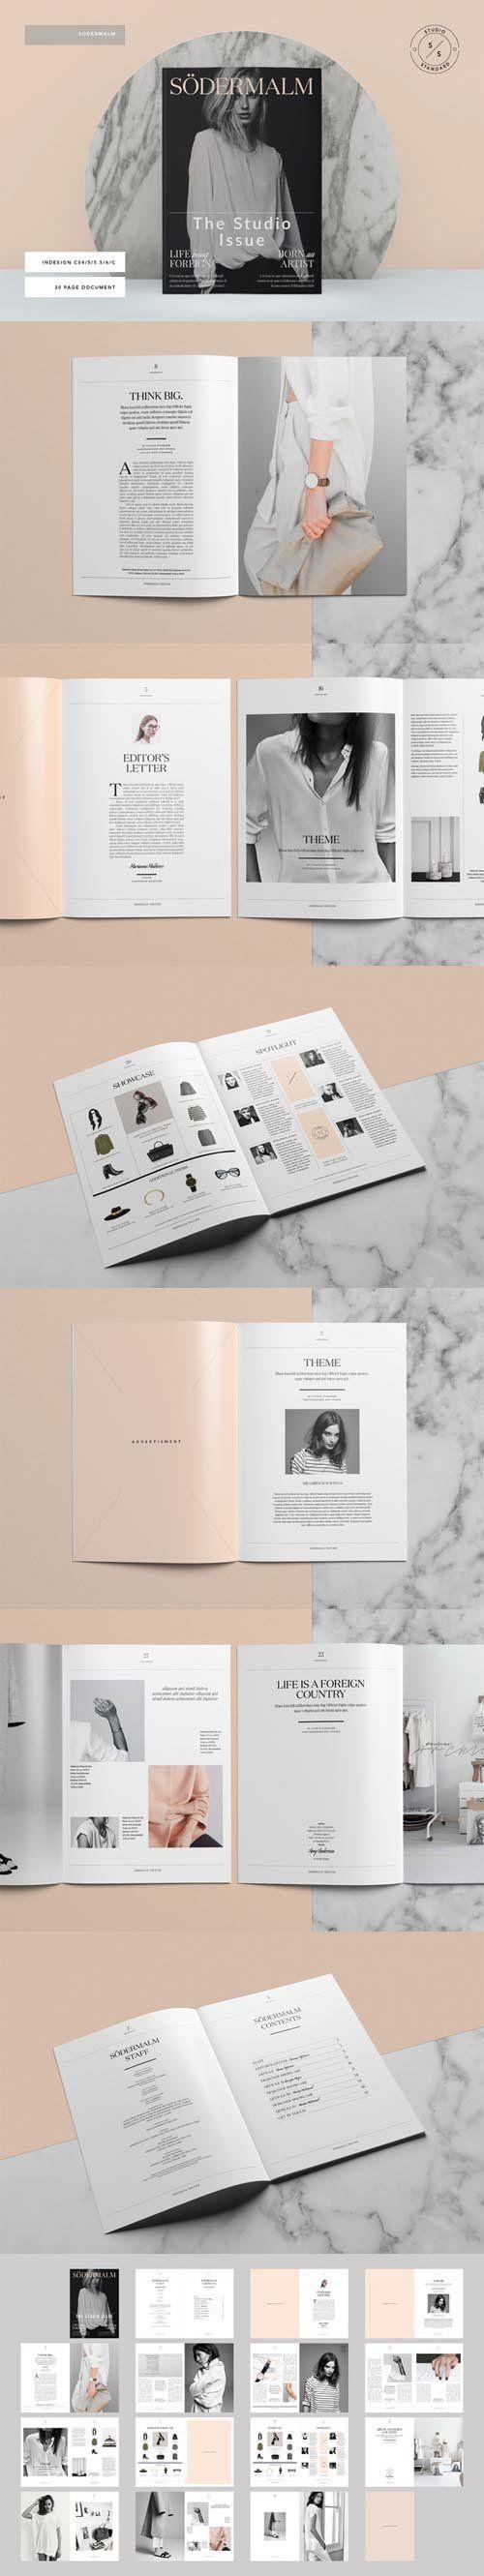 Sodermalm Magazine 360248 | Magazines, Indesign templates and Salon logo